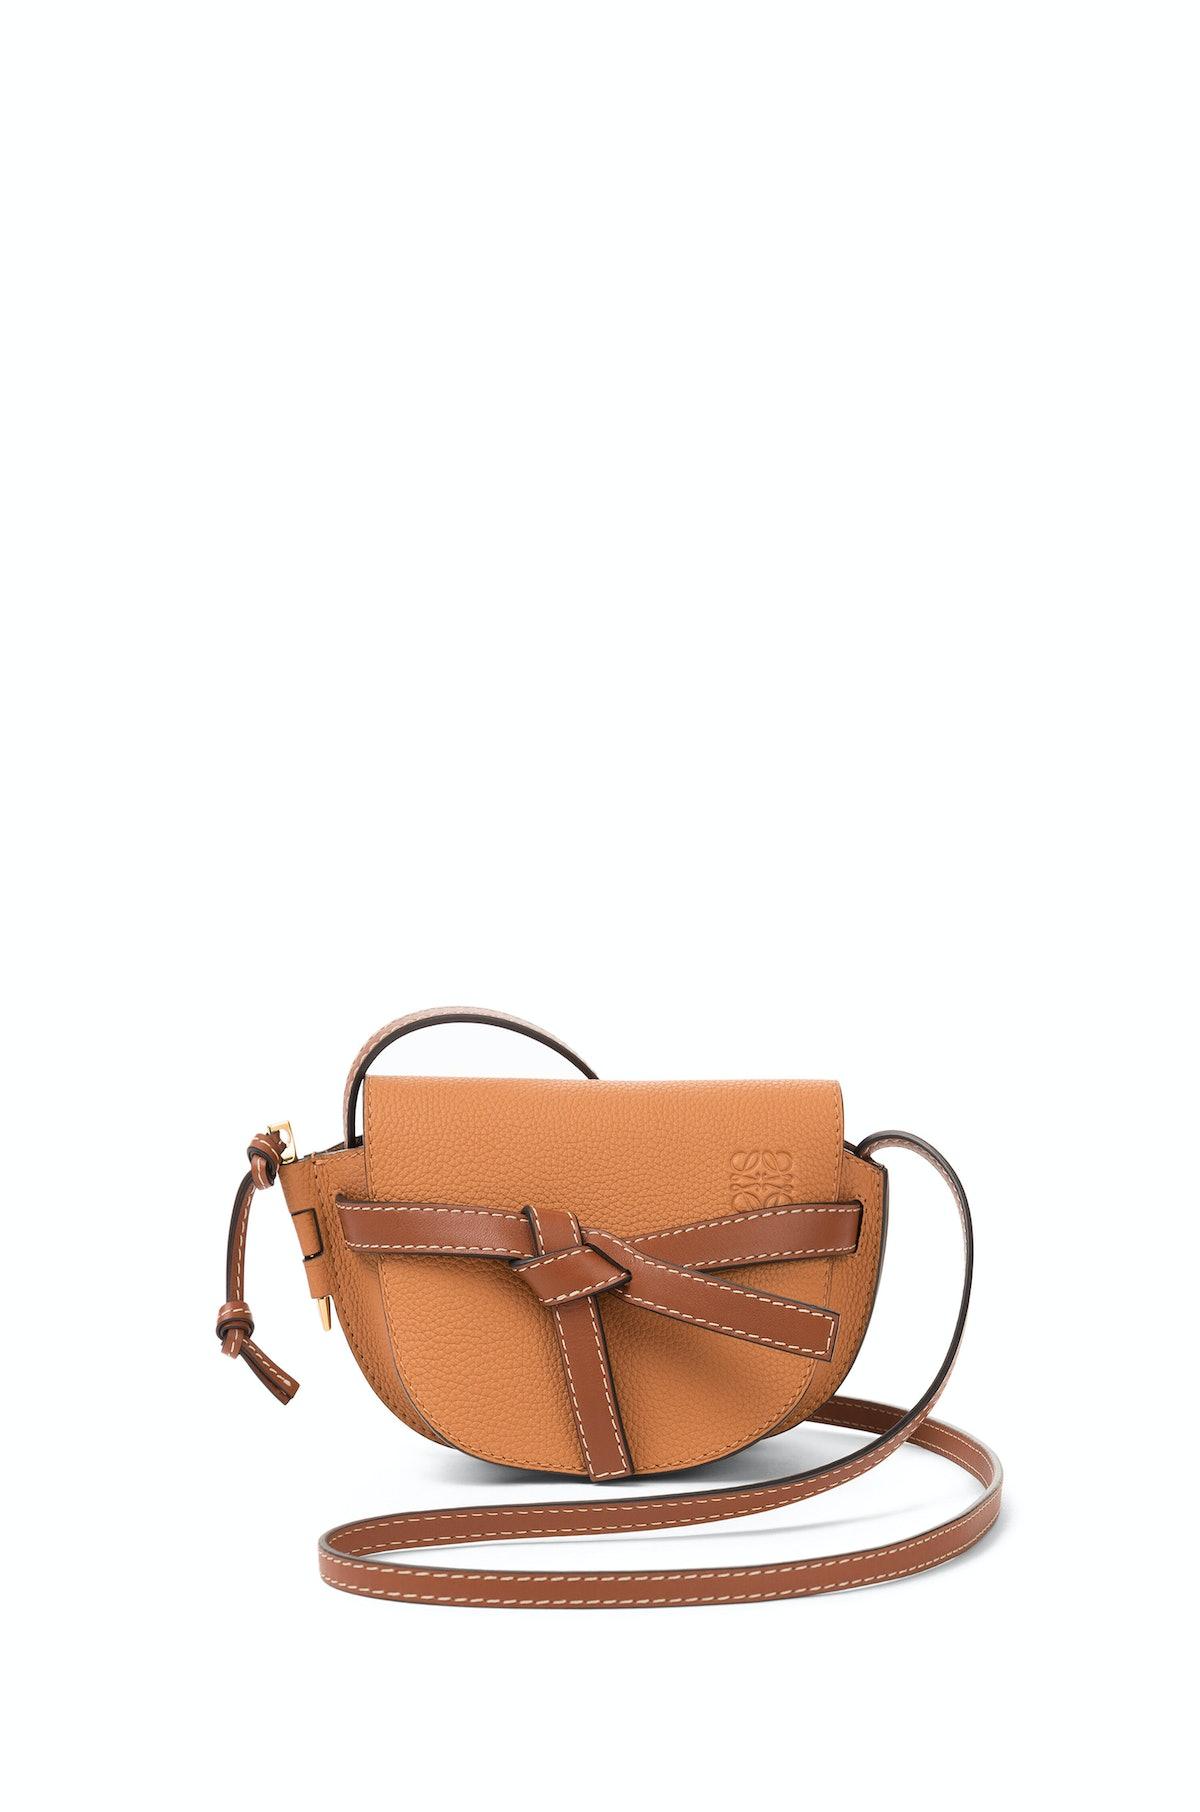 Mini Gate Bag in Light Caramel/Pecan